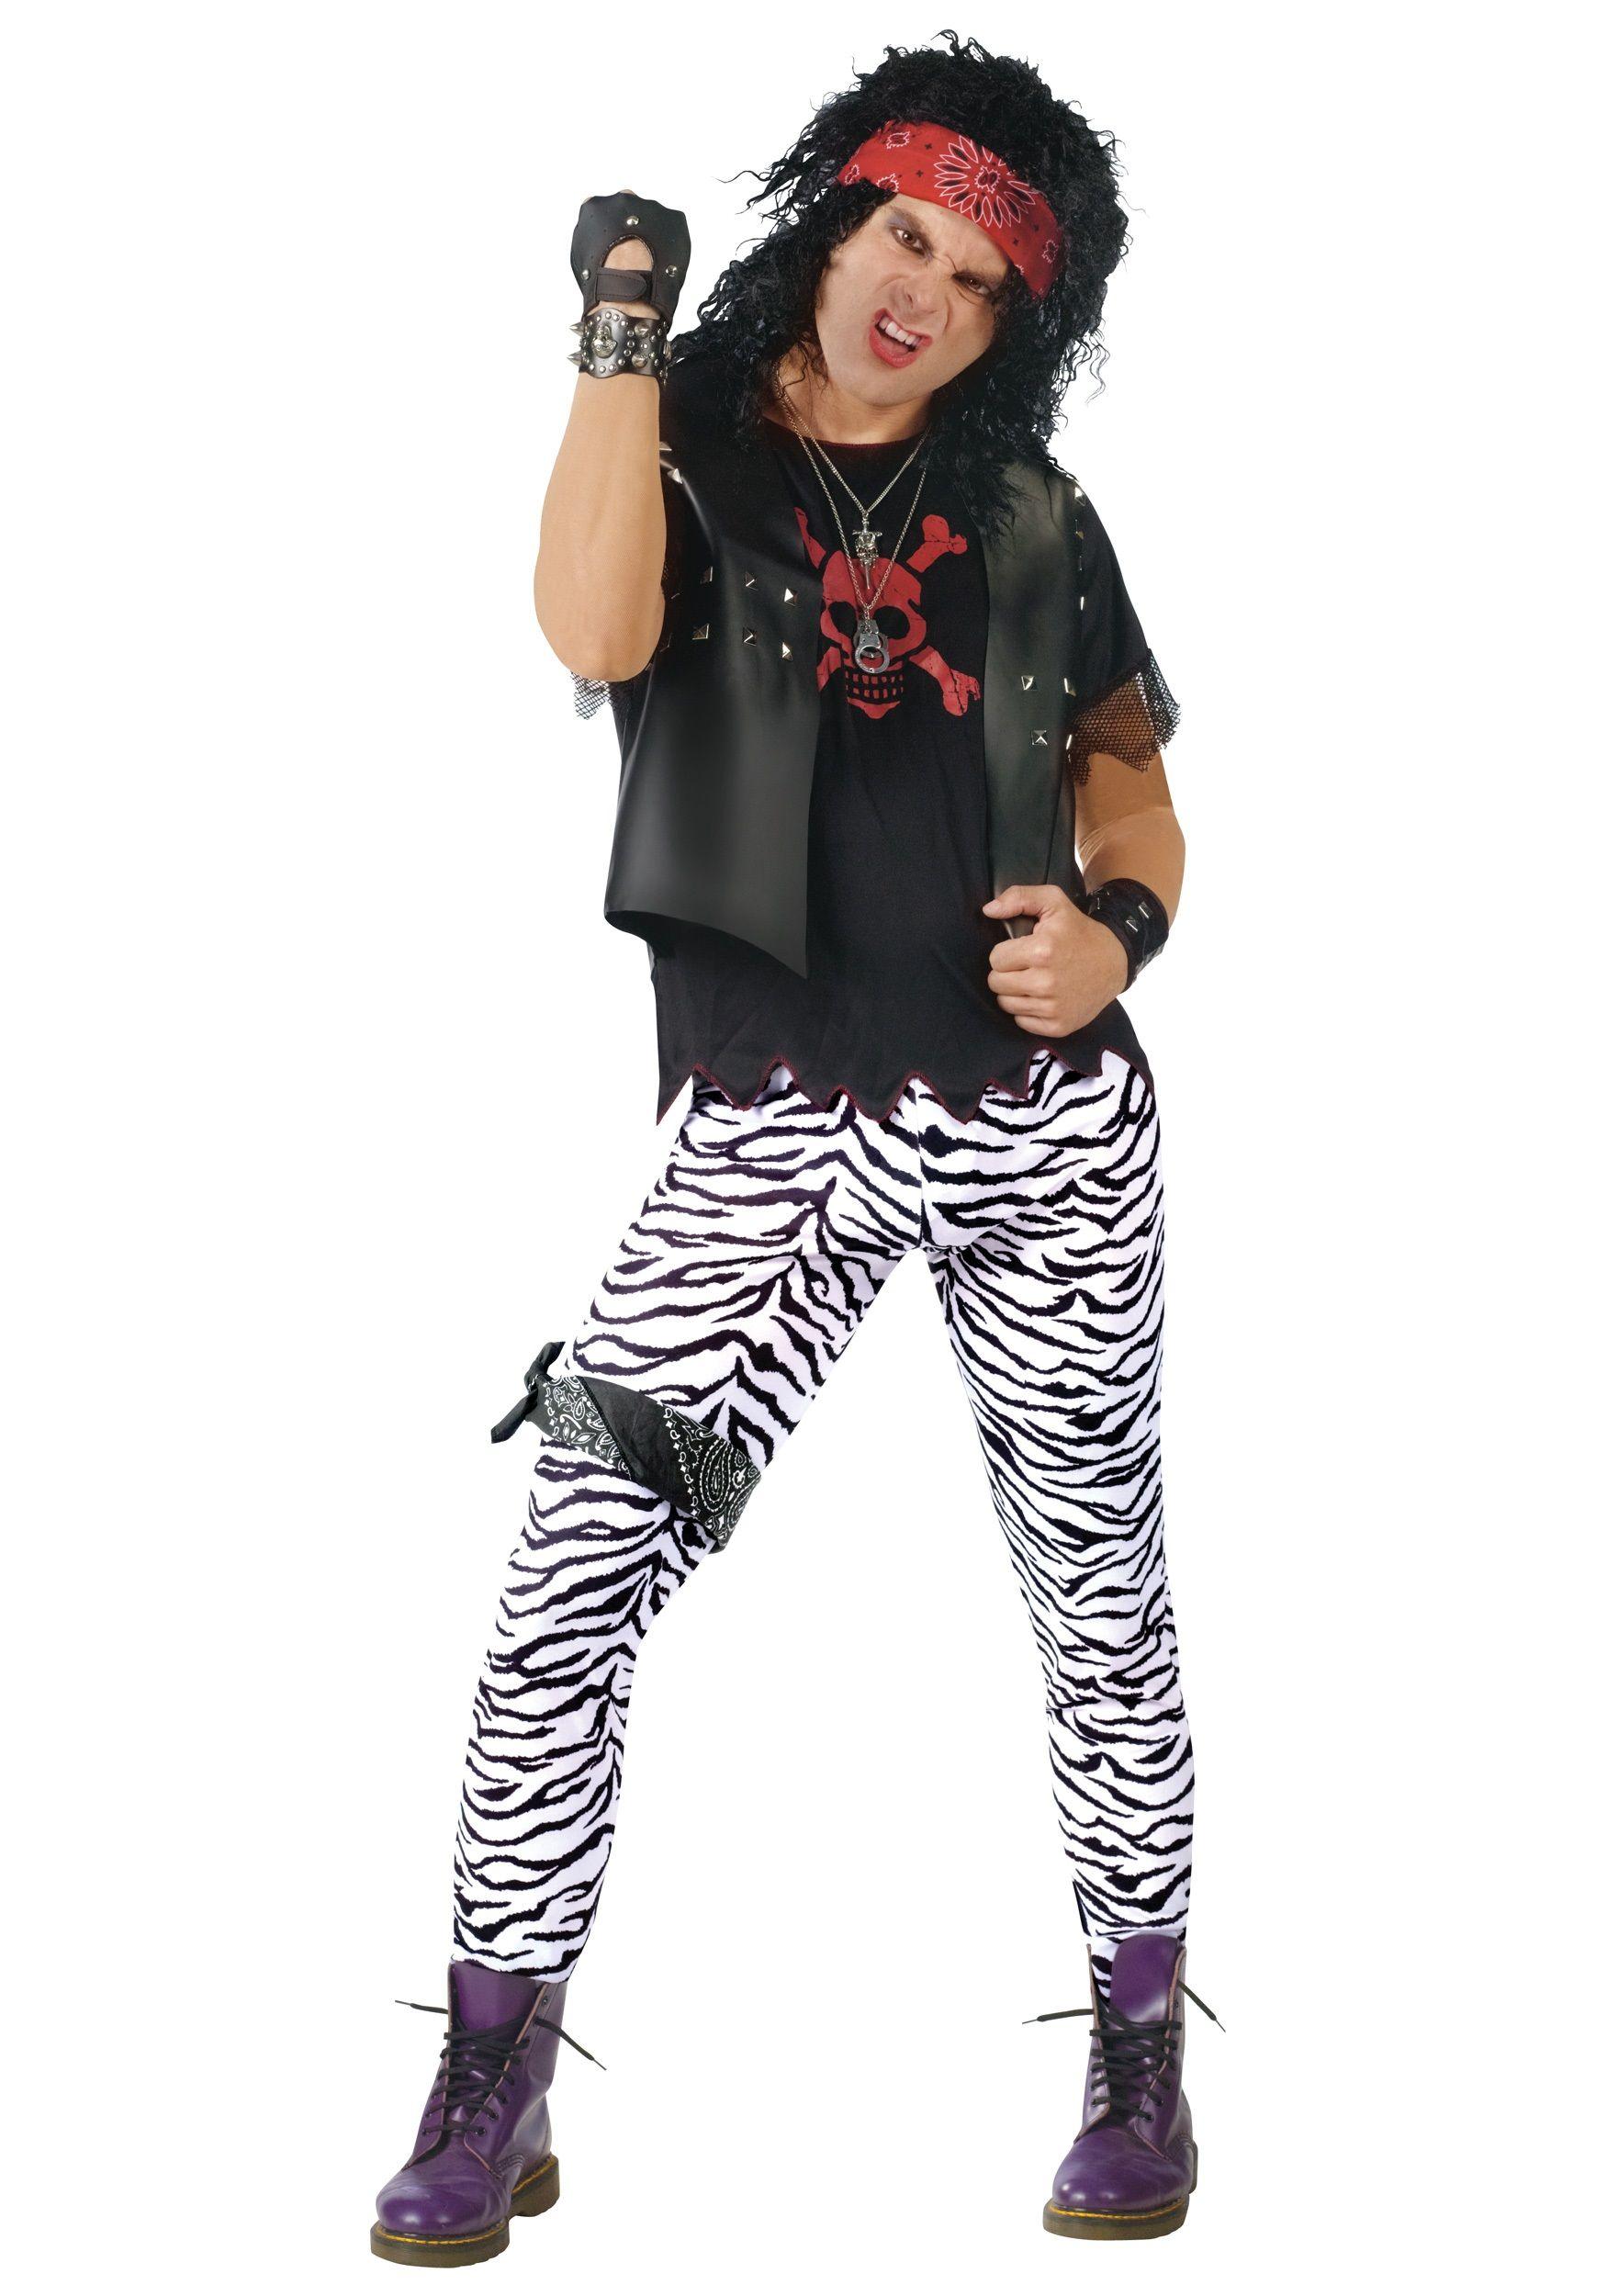 rockstar outfits - Google Search | Rockband | Pinterest | Costumes ...